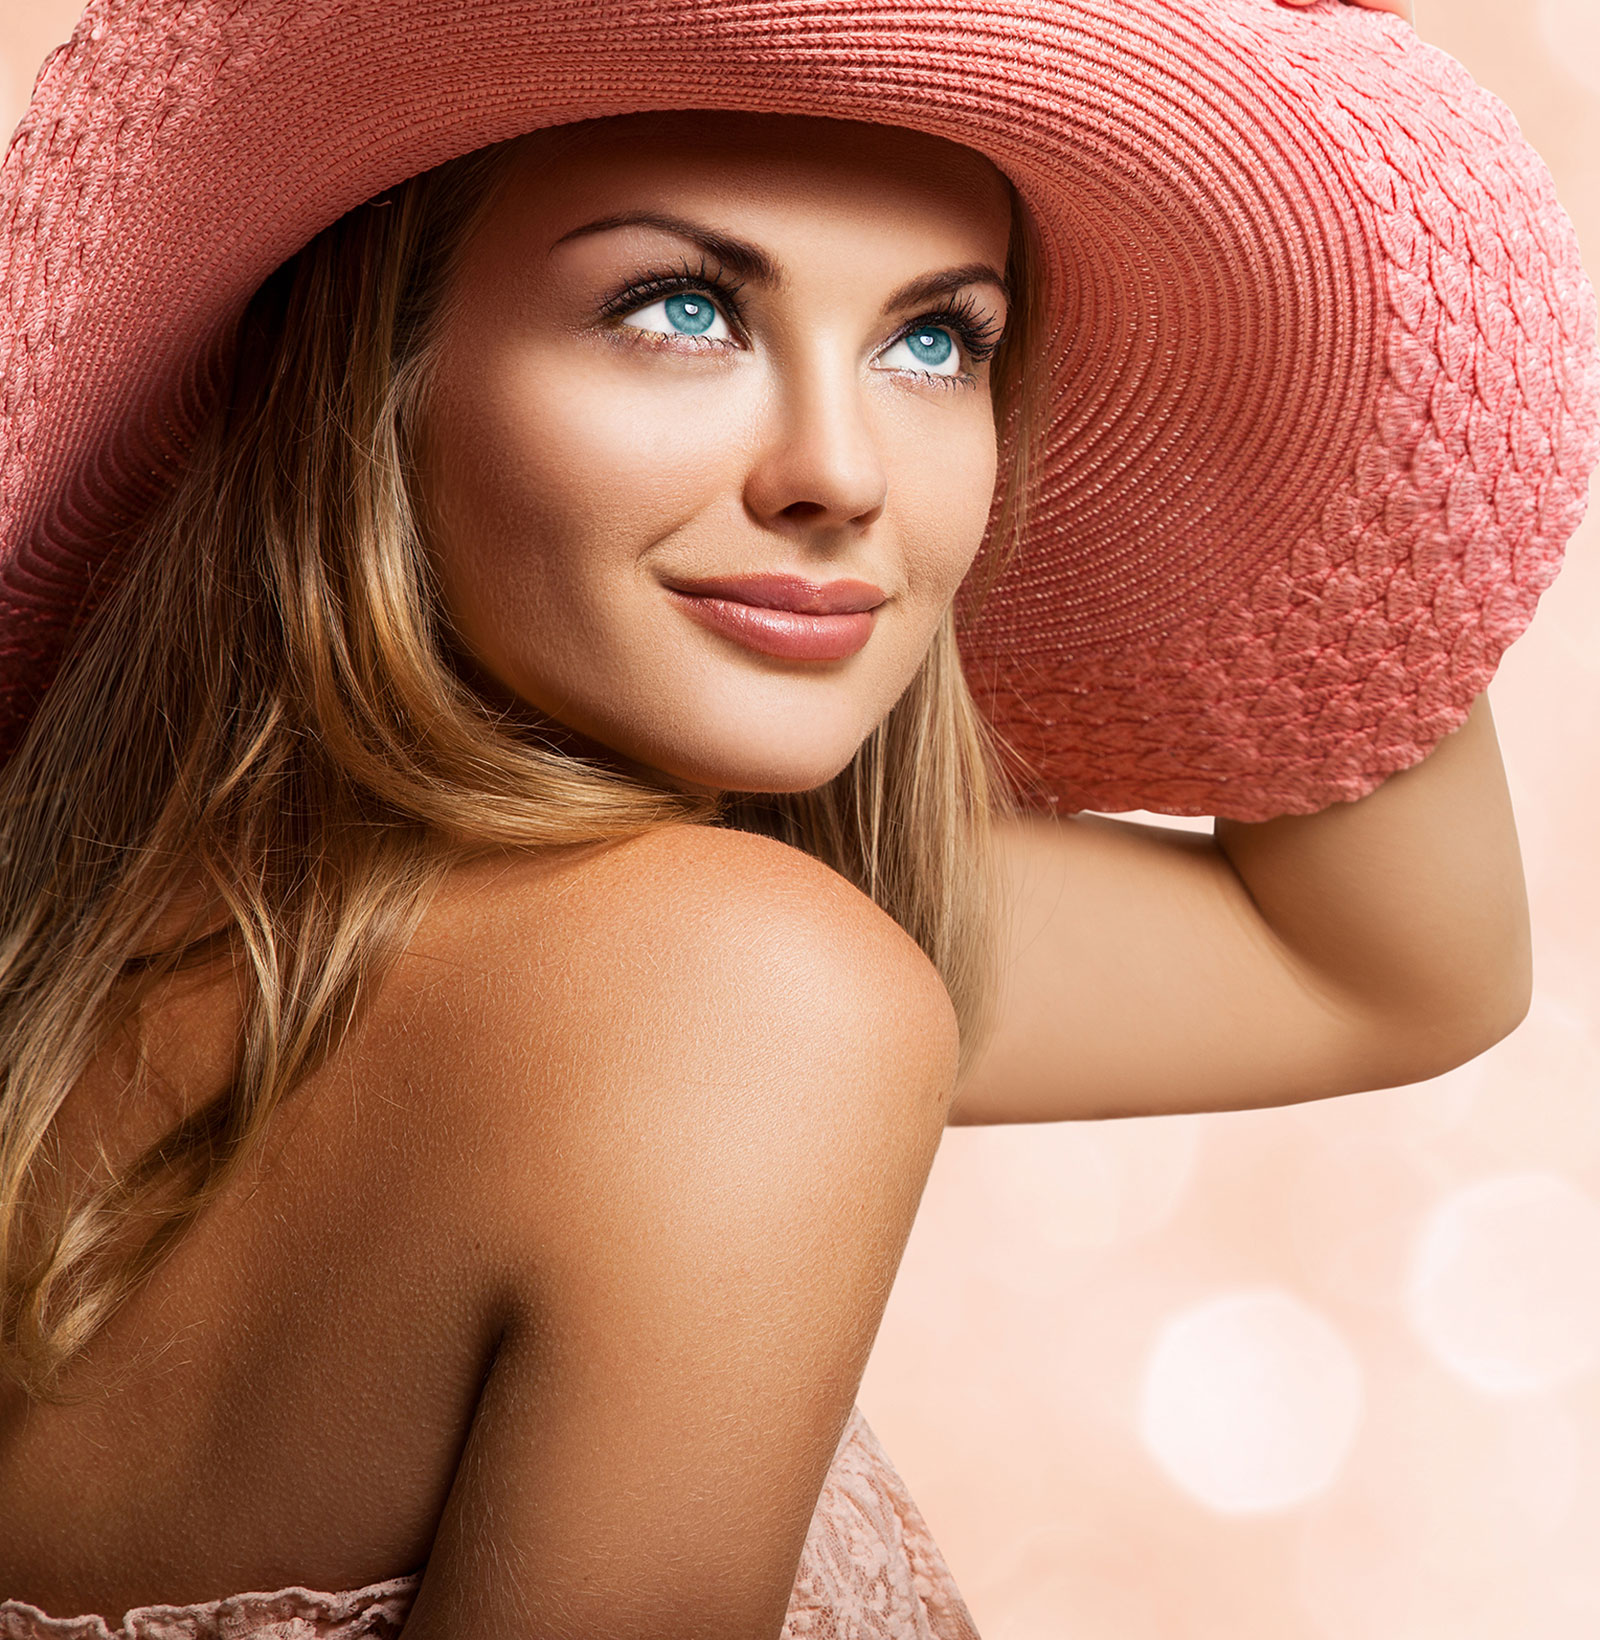 Woman-Hat-Lashes-web2